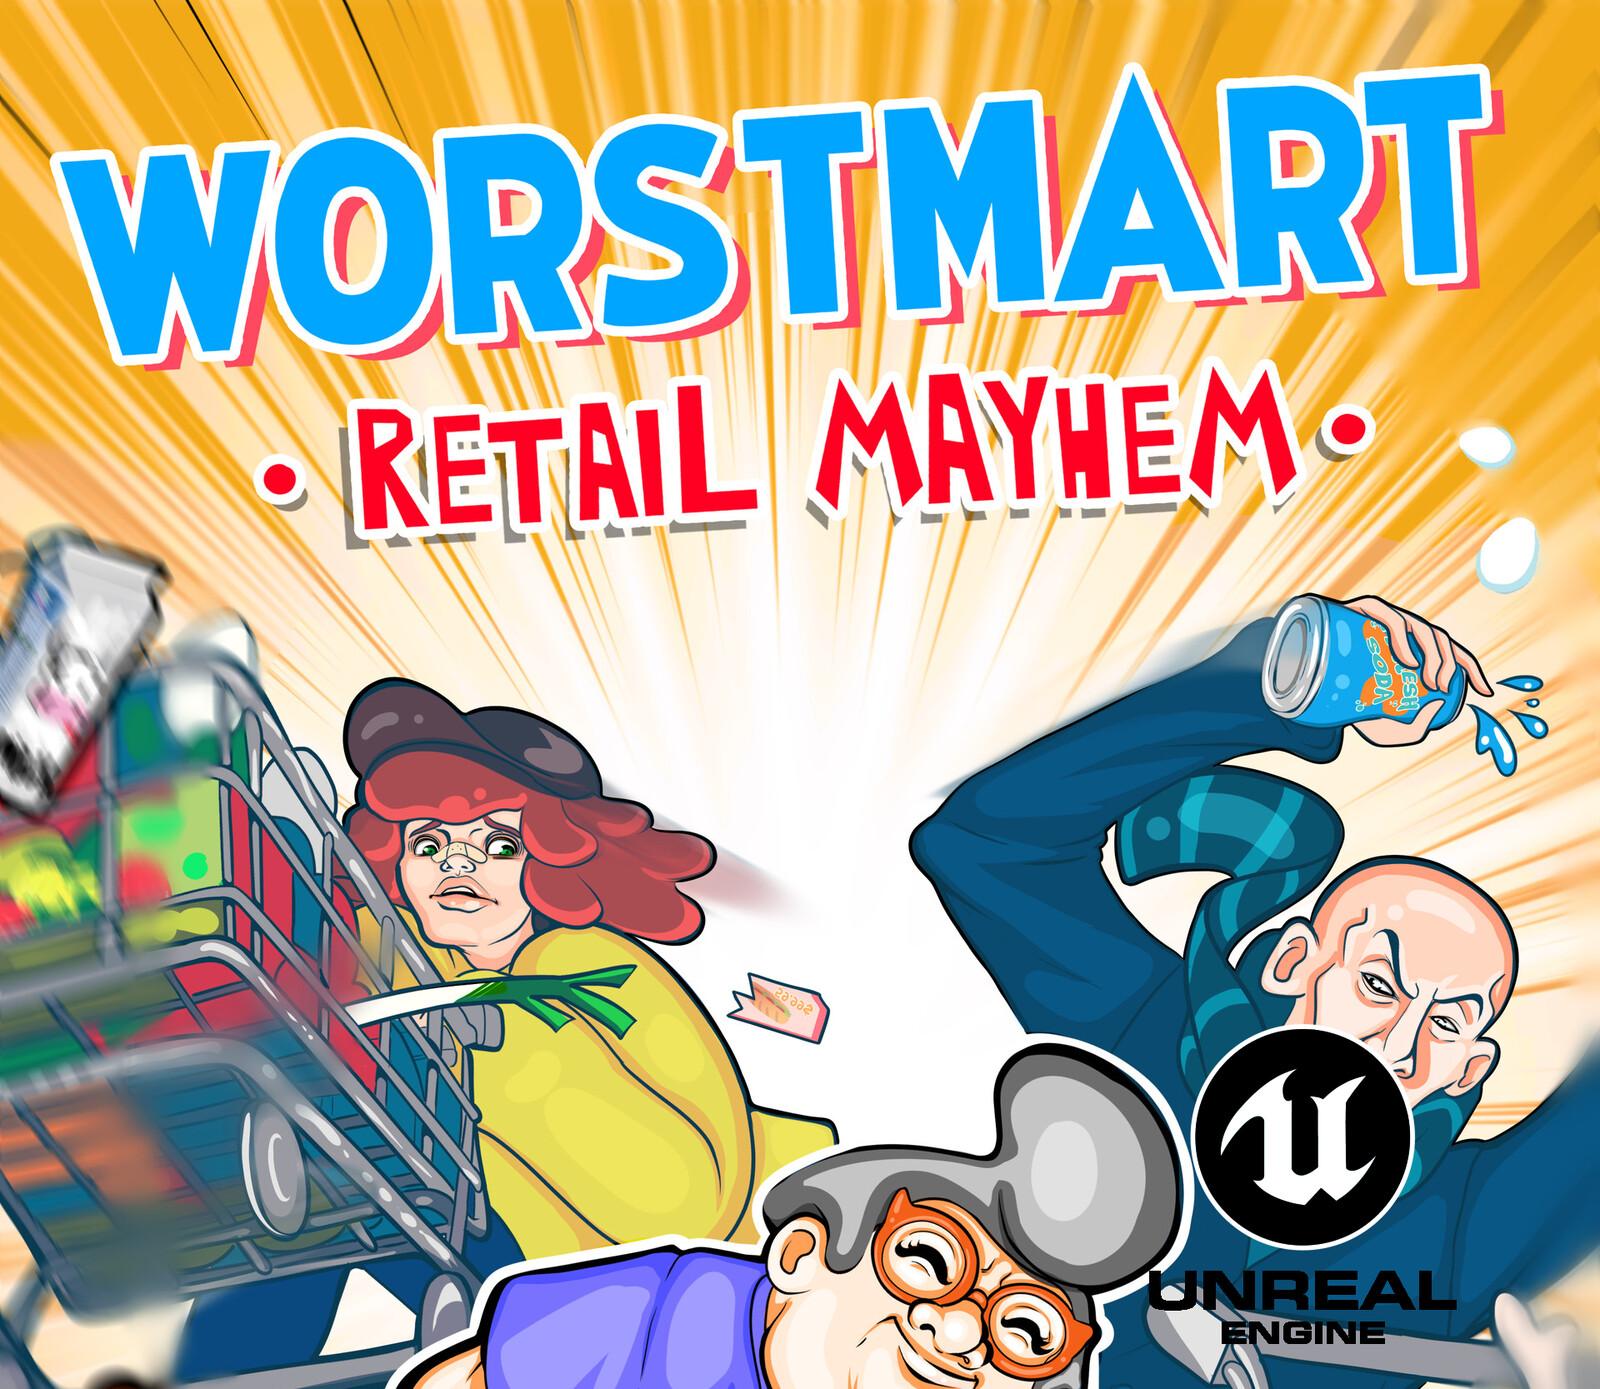 Worstmart: Retail Mayhem VFX